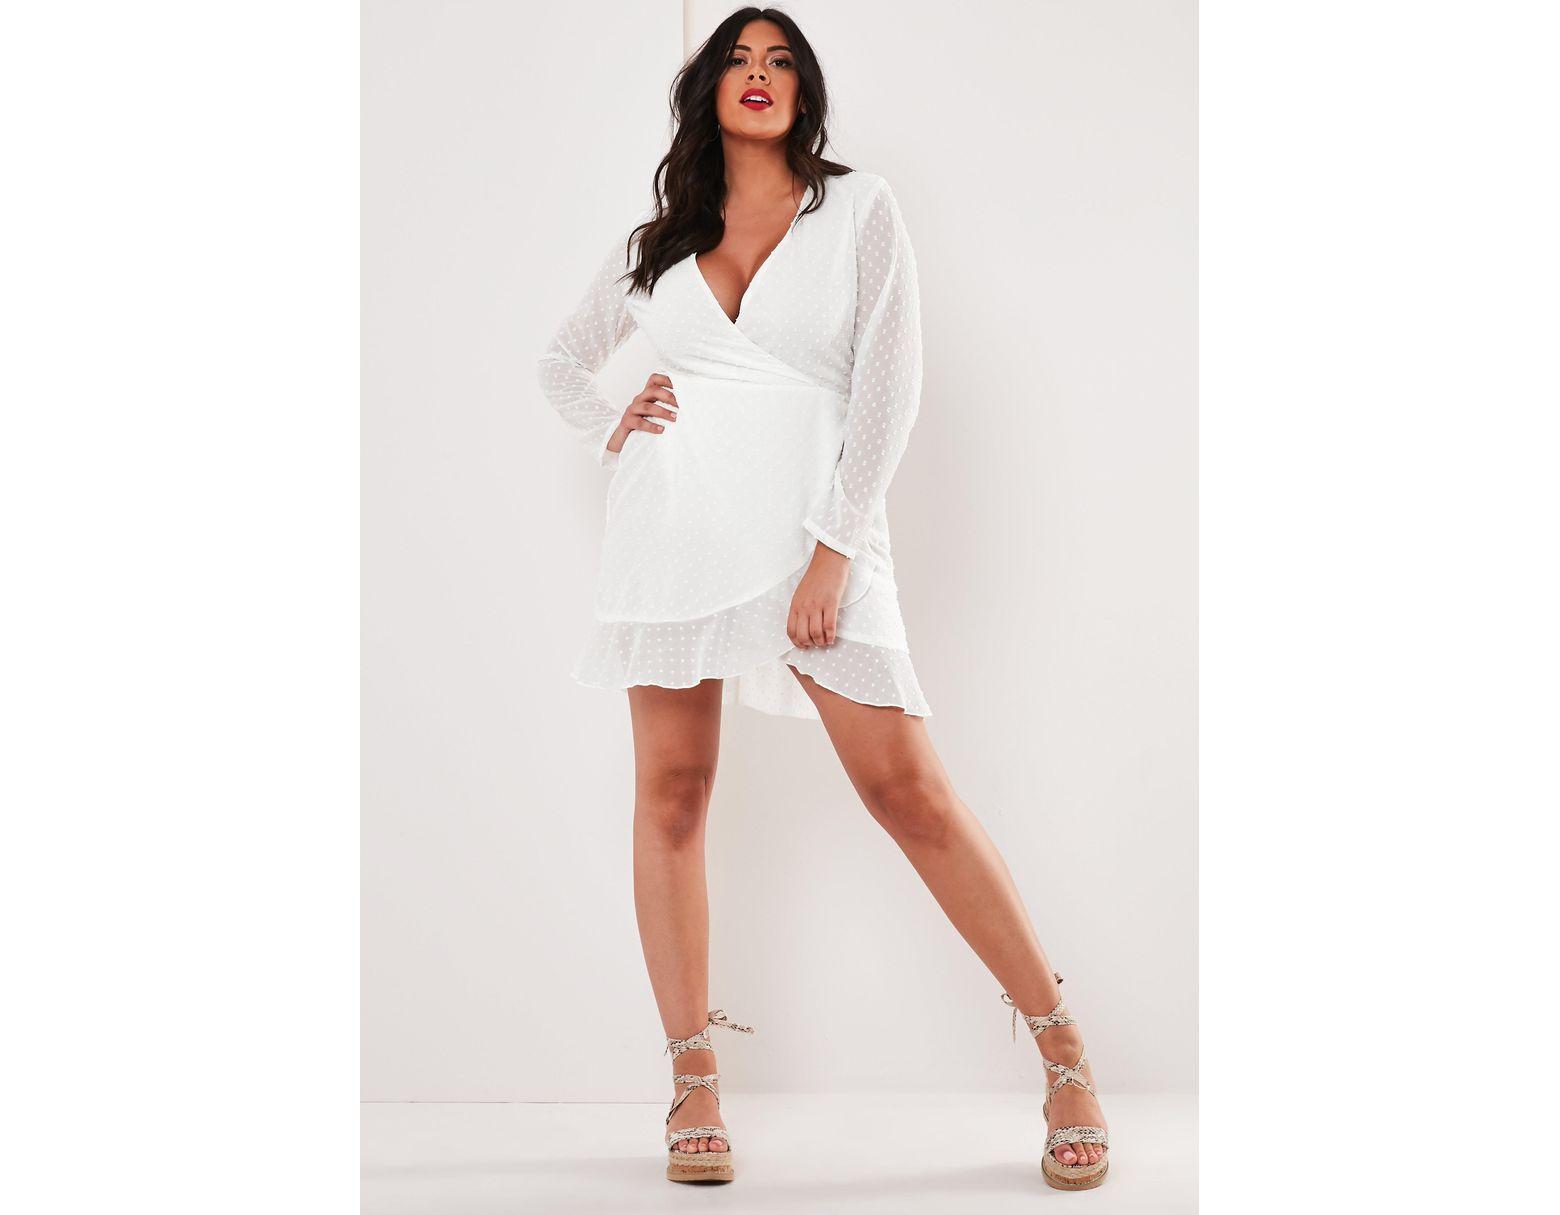 d61e4e6f61 Lyst - Missguided Plus Size White Dobby Wrap Front Mini Dress in White